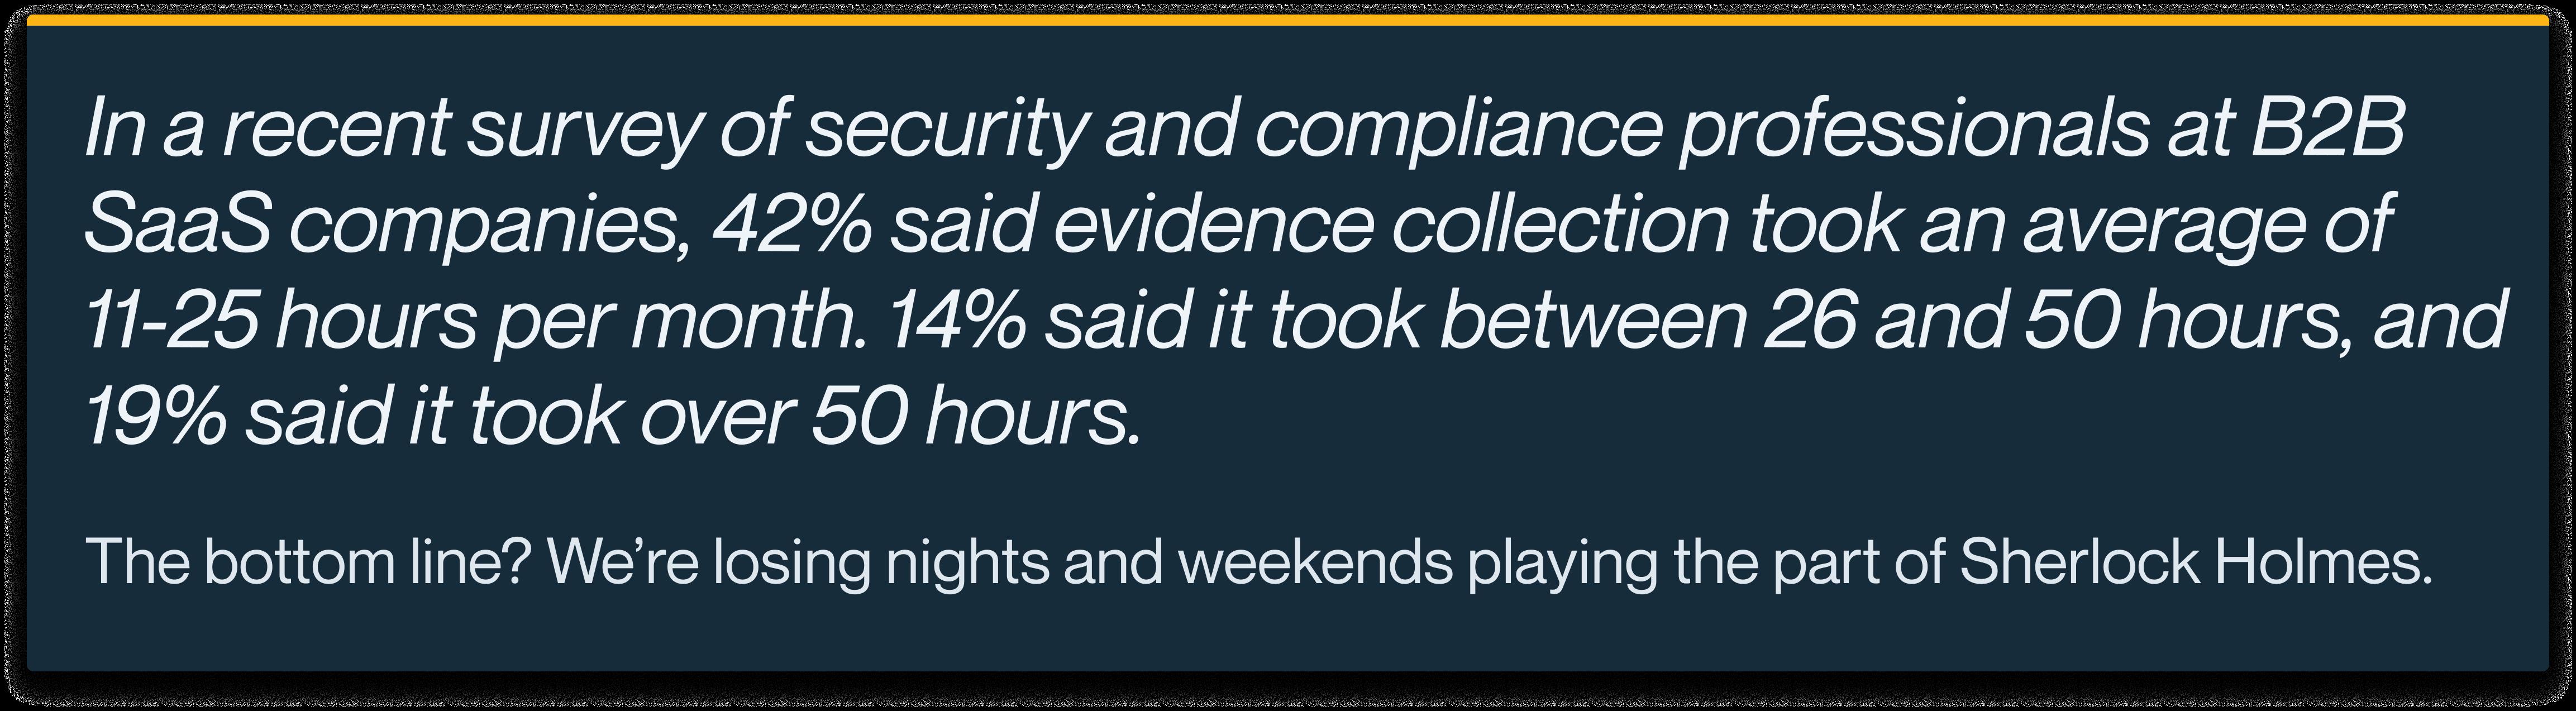 Statistics on compliance at B2B SaaS companies